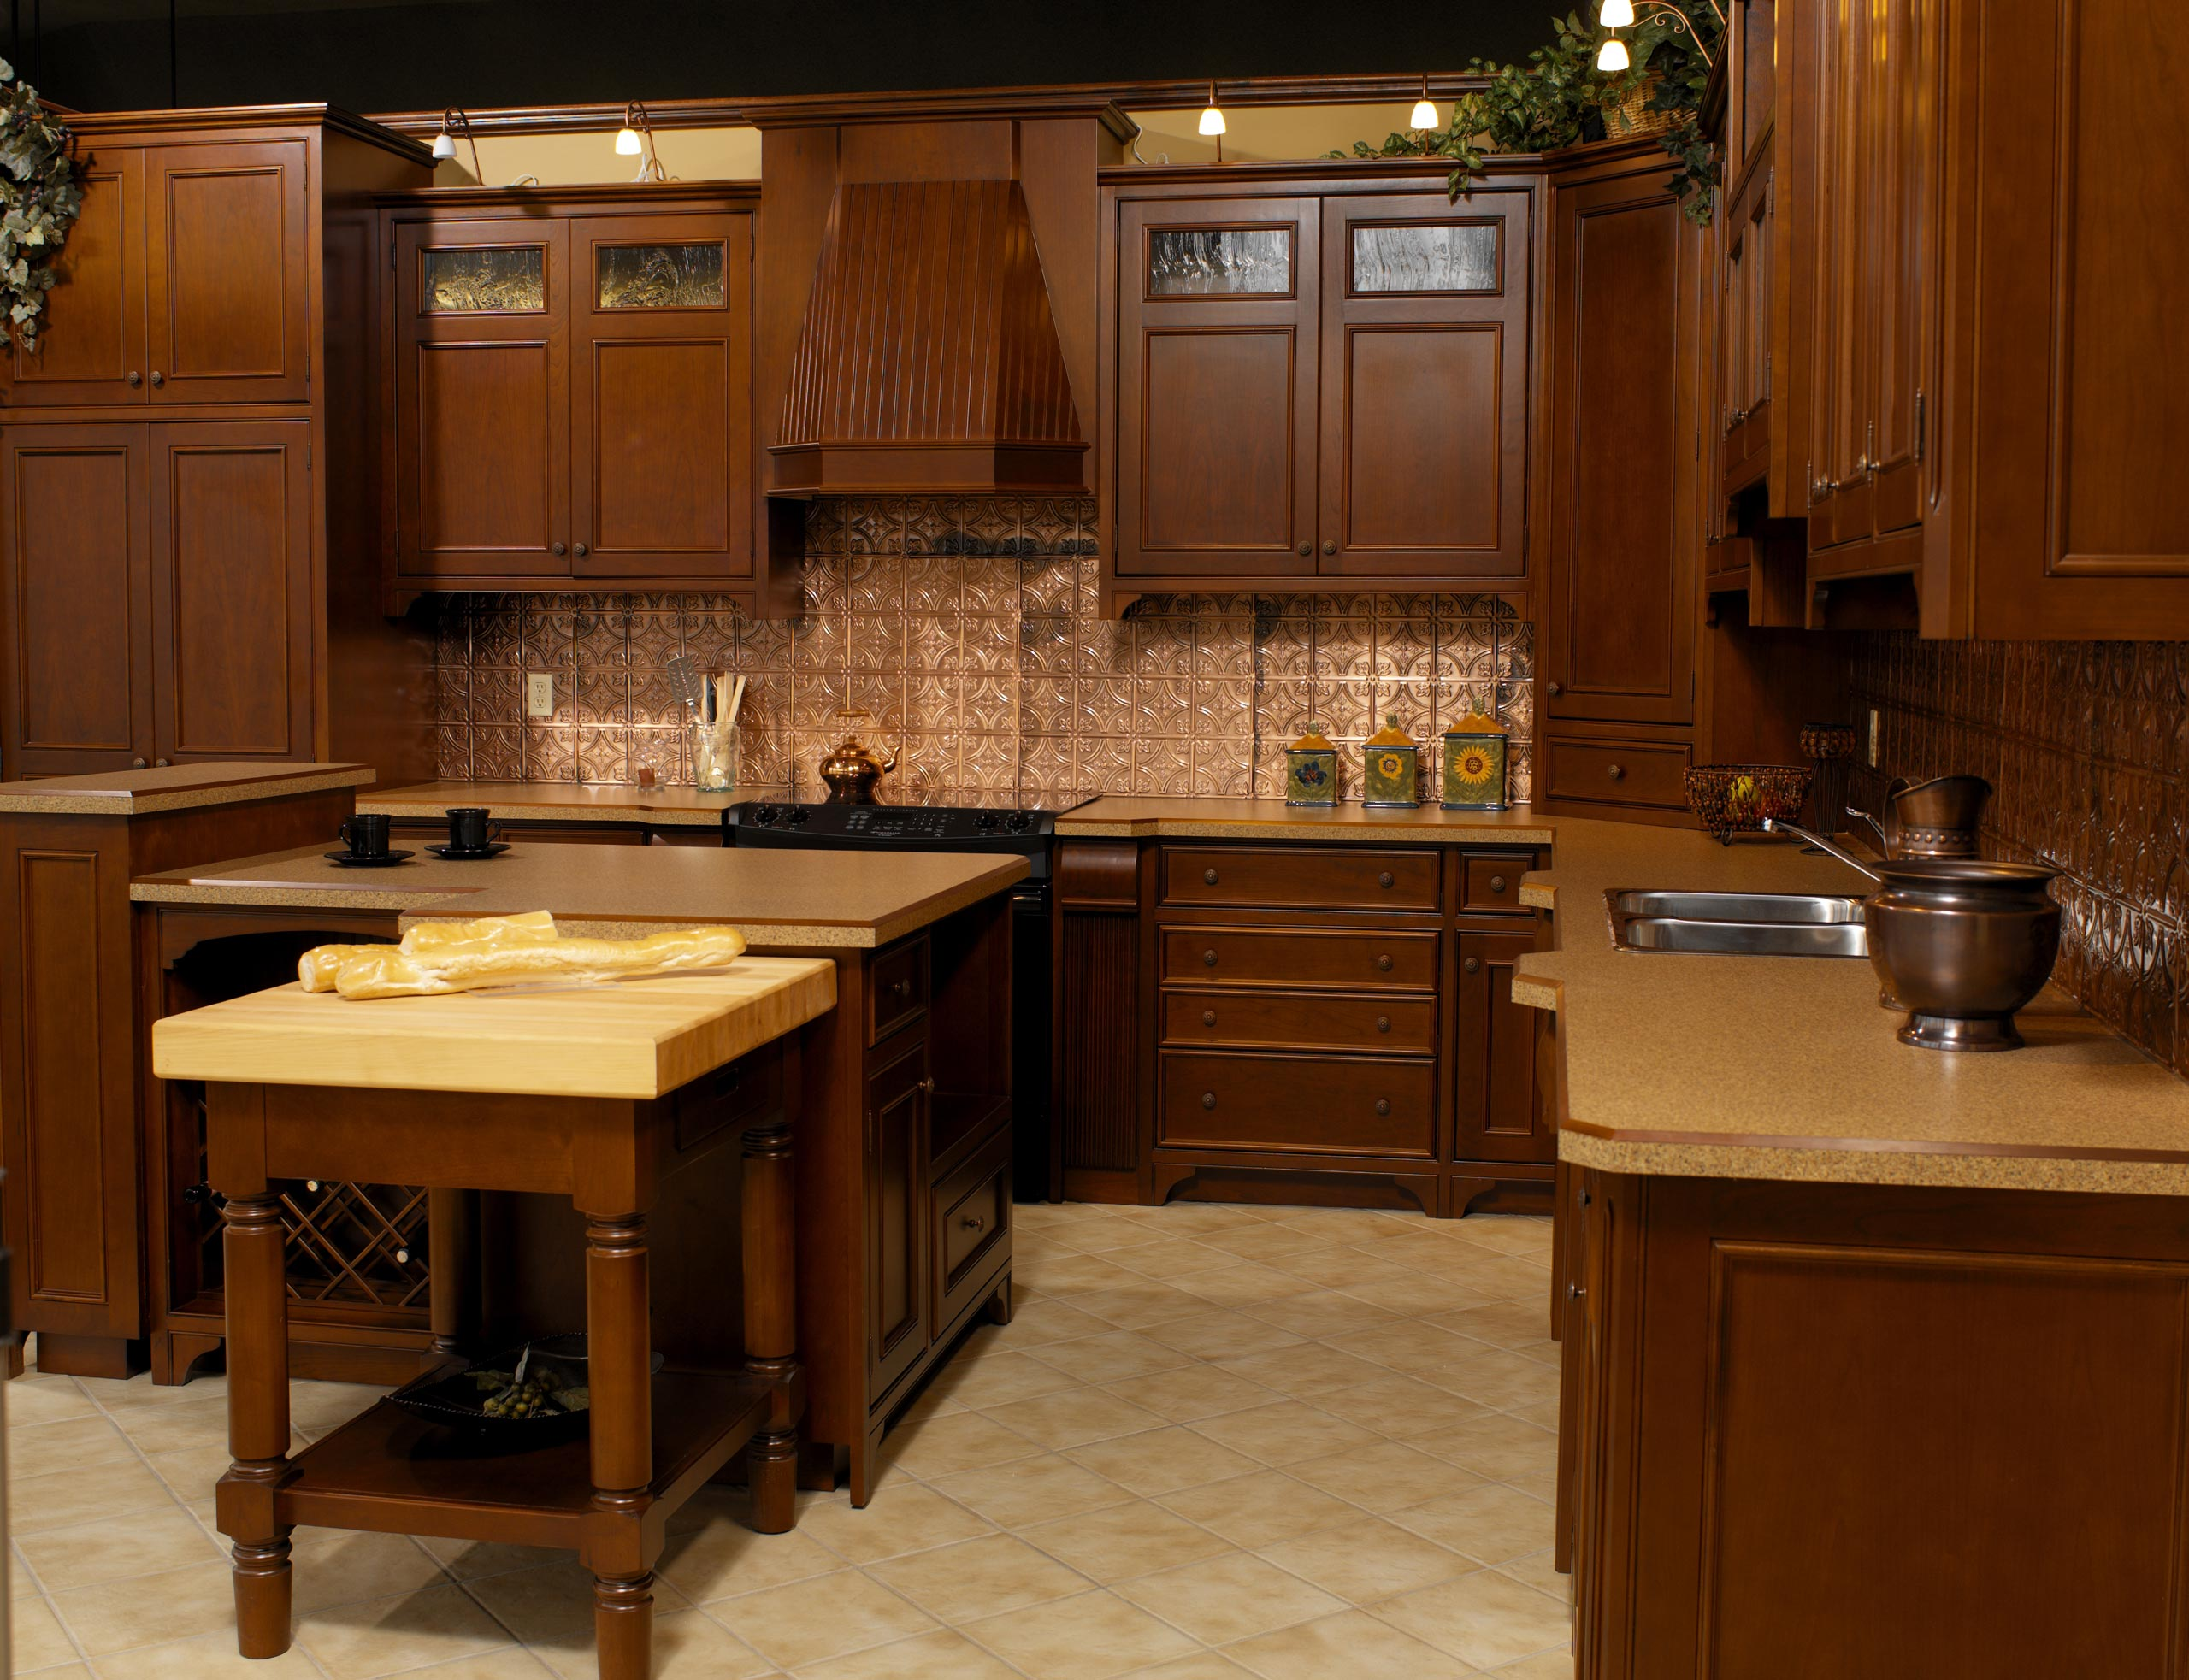 Tudor Style Kitchen - Before